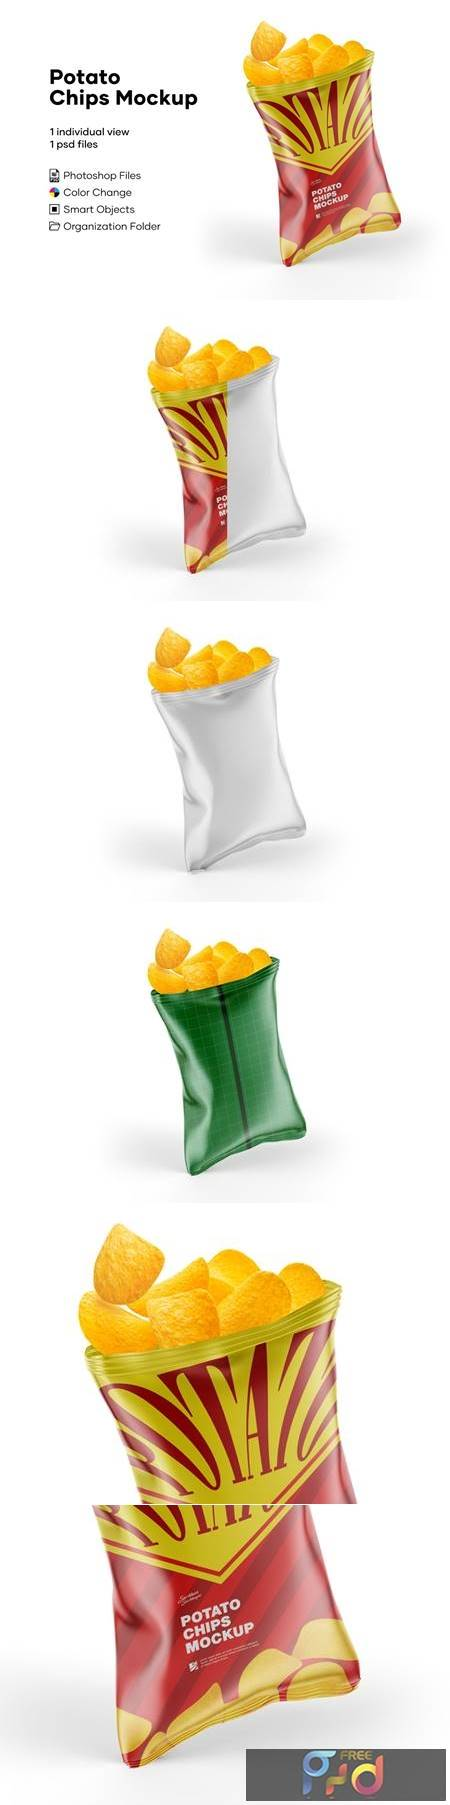 Potato Chips Mockup 5224073 1